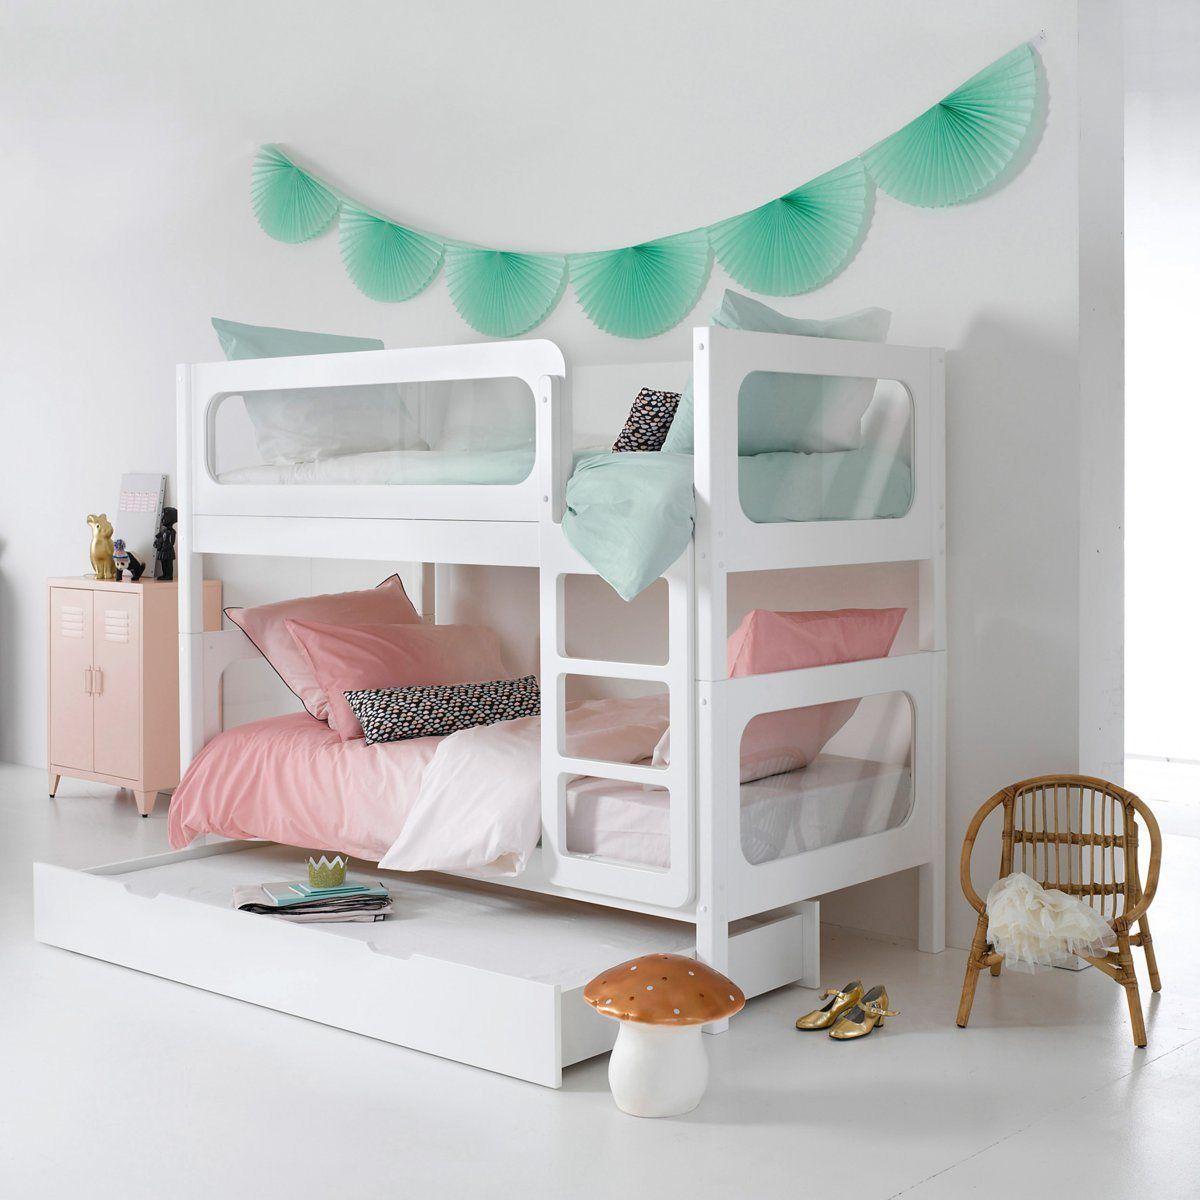 lits superpos s pilha am pm la redoute kids. Black Bedroom Furniture Sets. Home Design Ideas